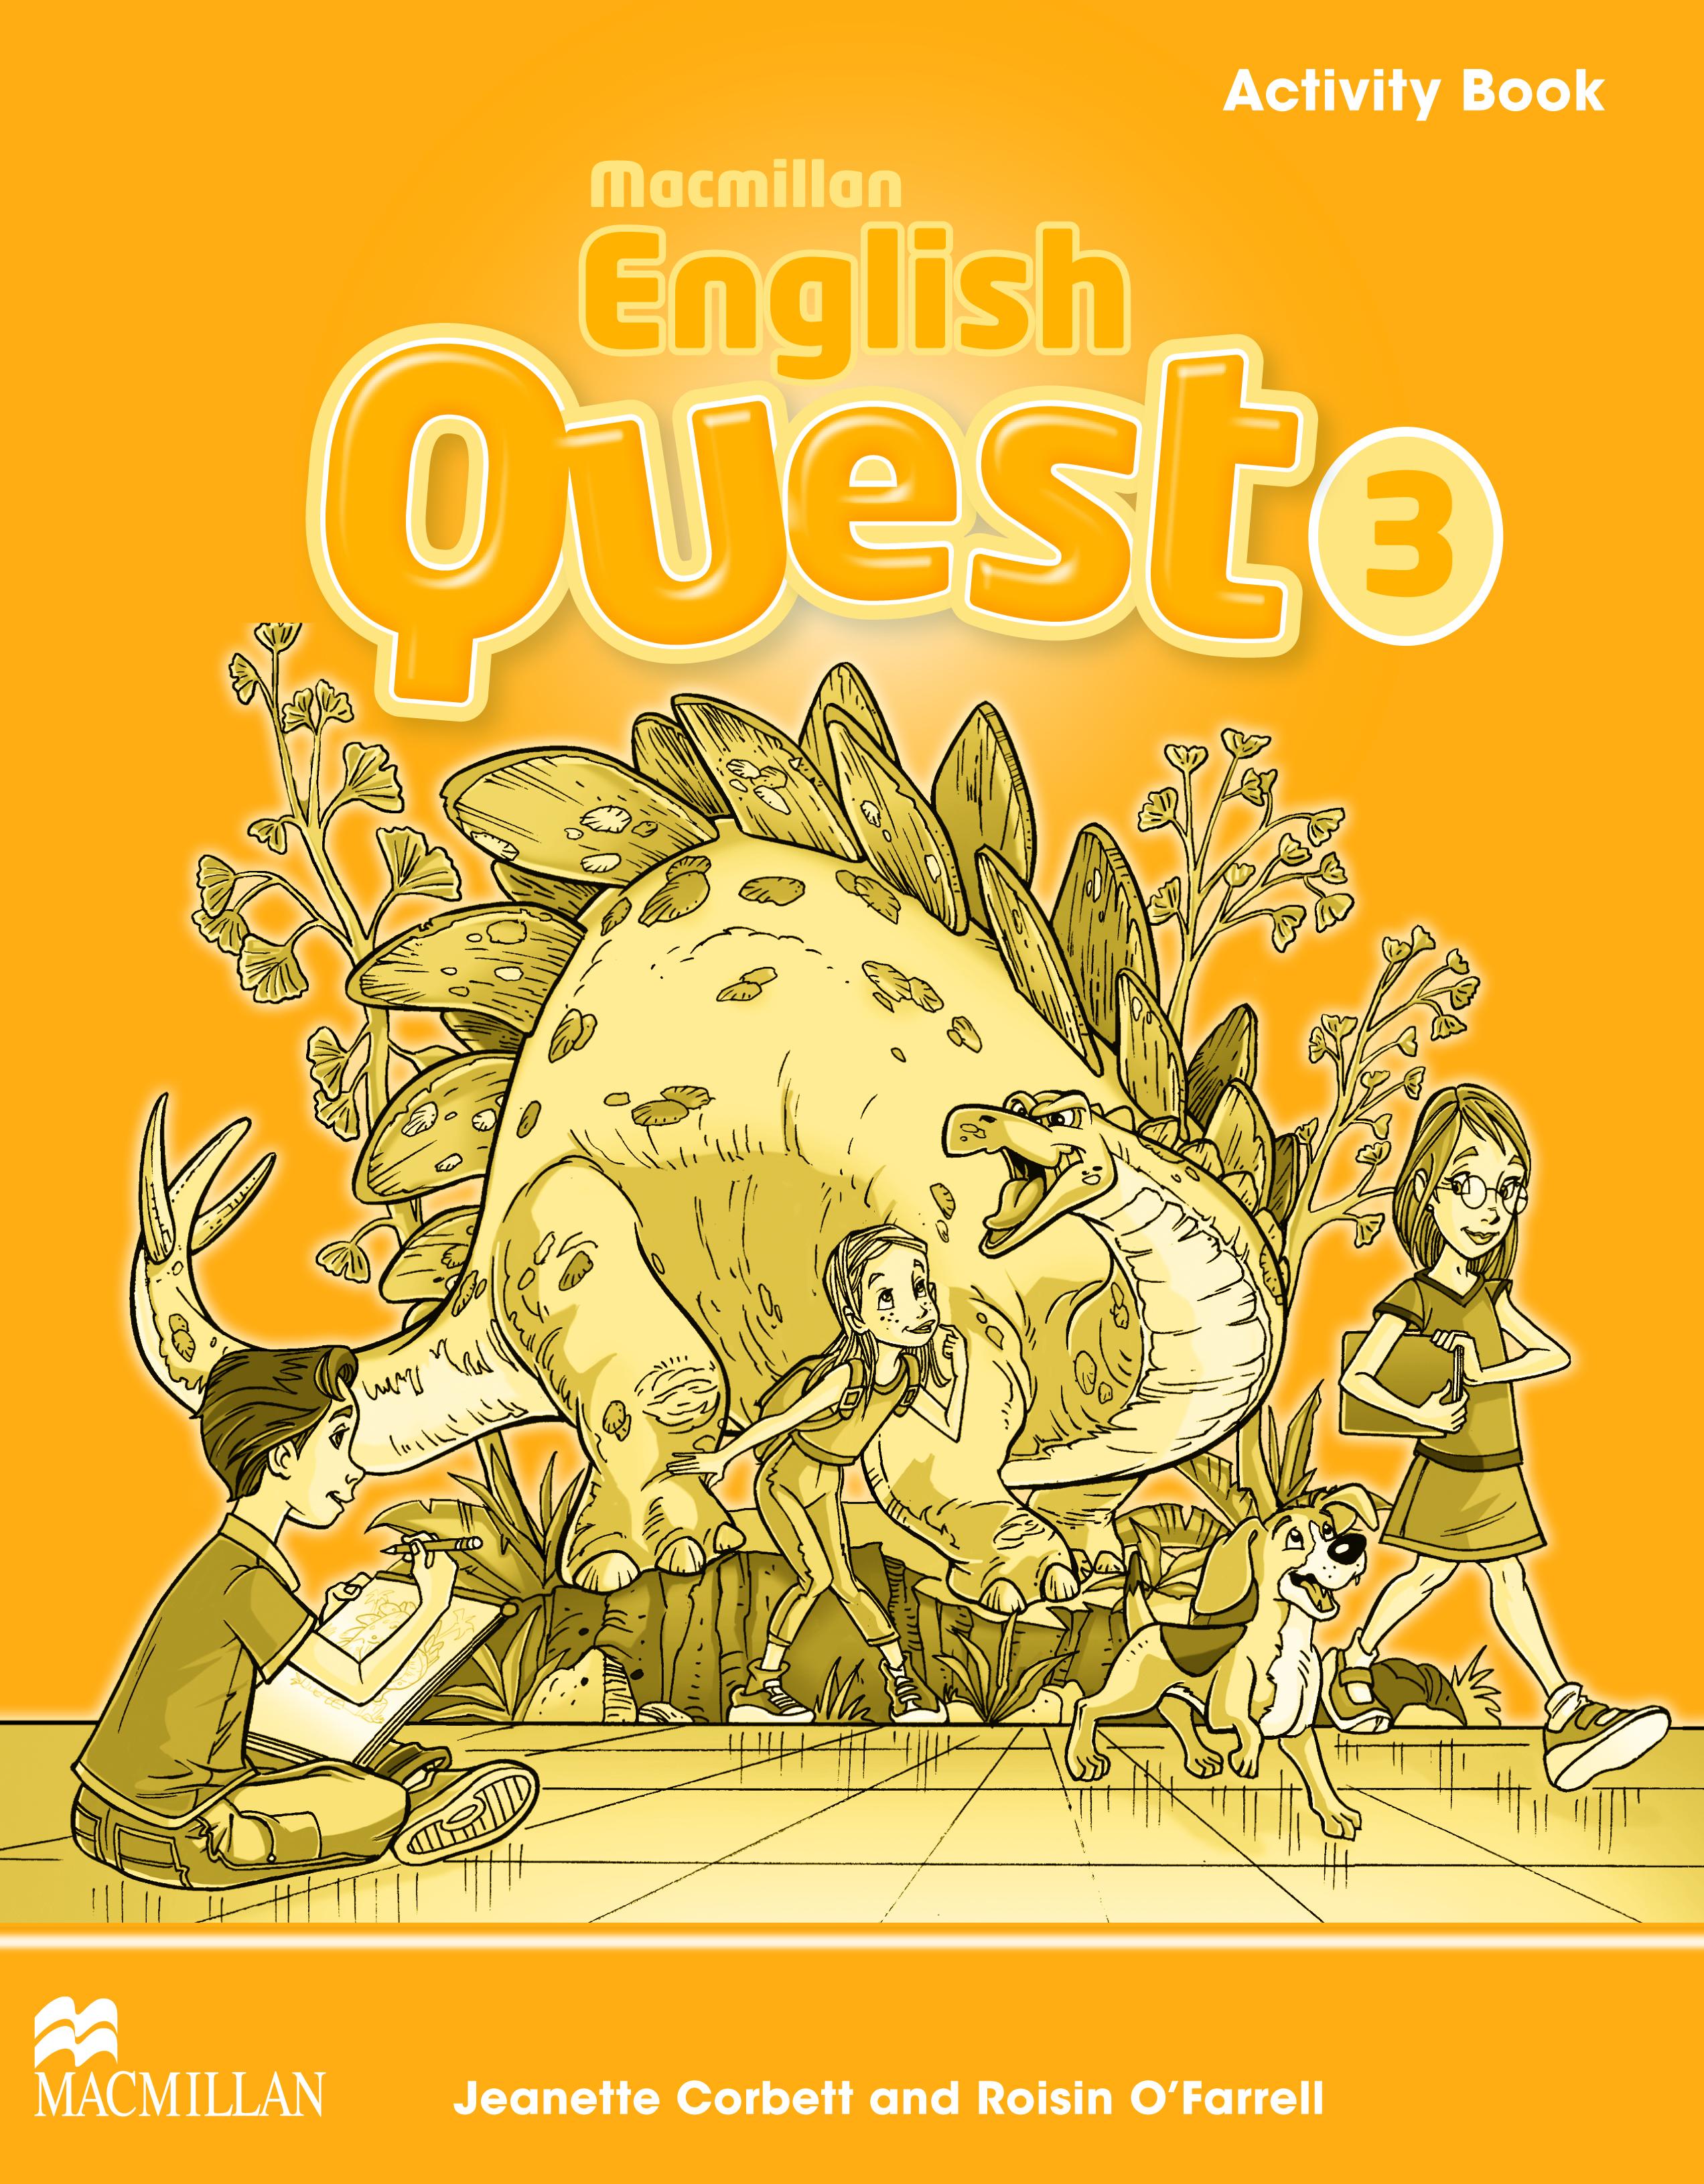 Macmillan English Quest 3 Activity Book